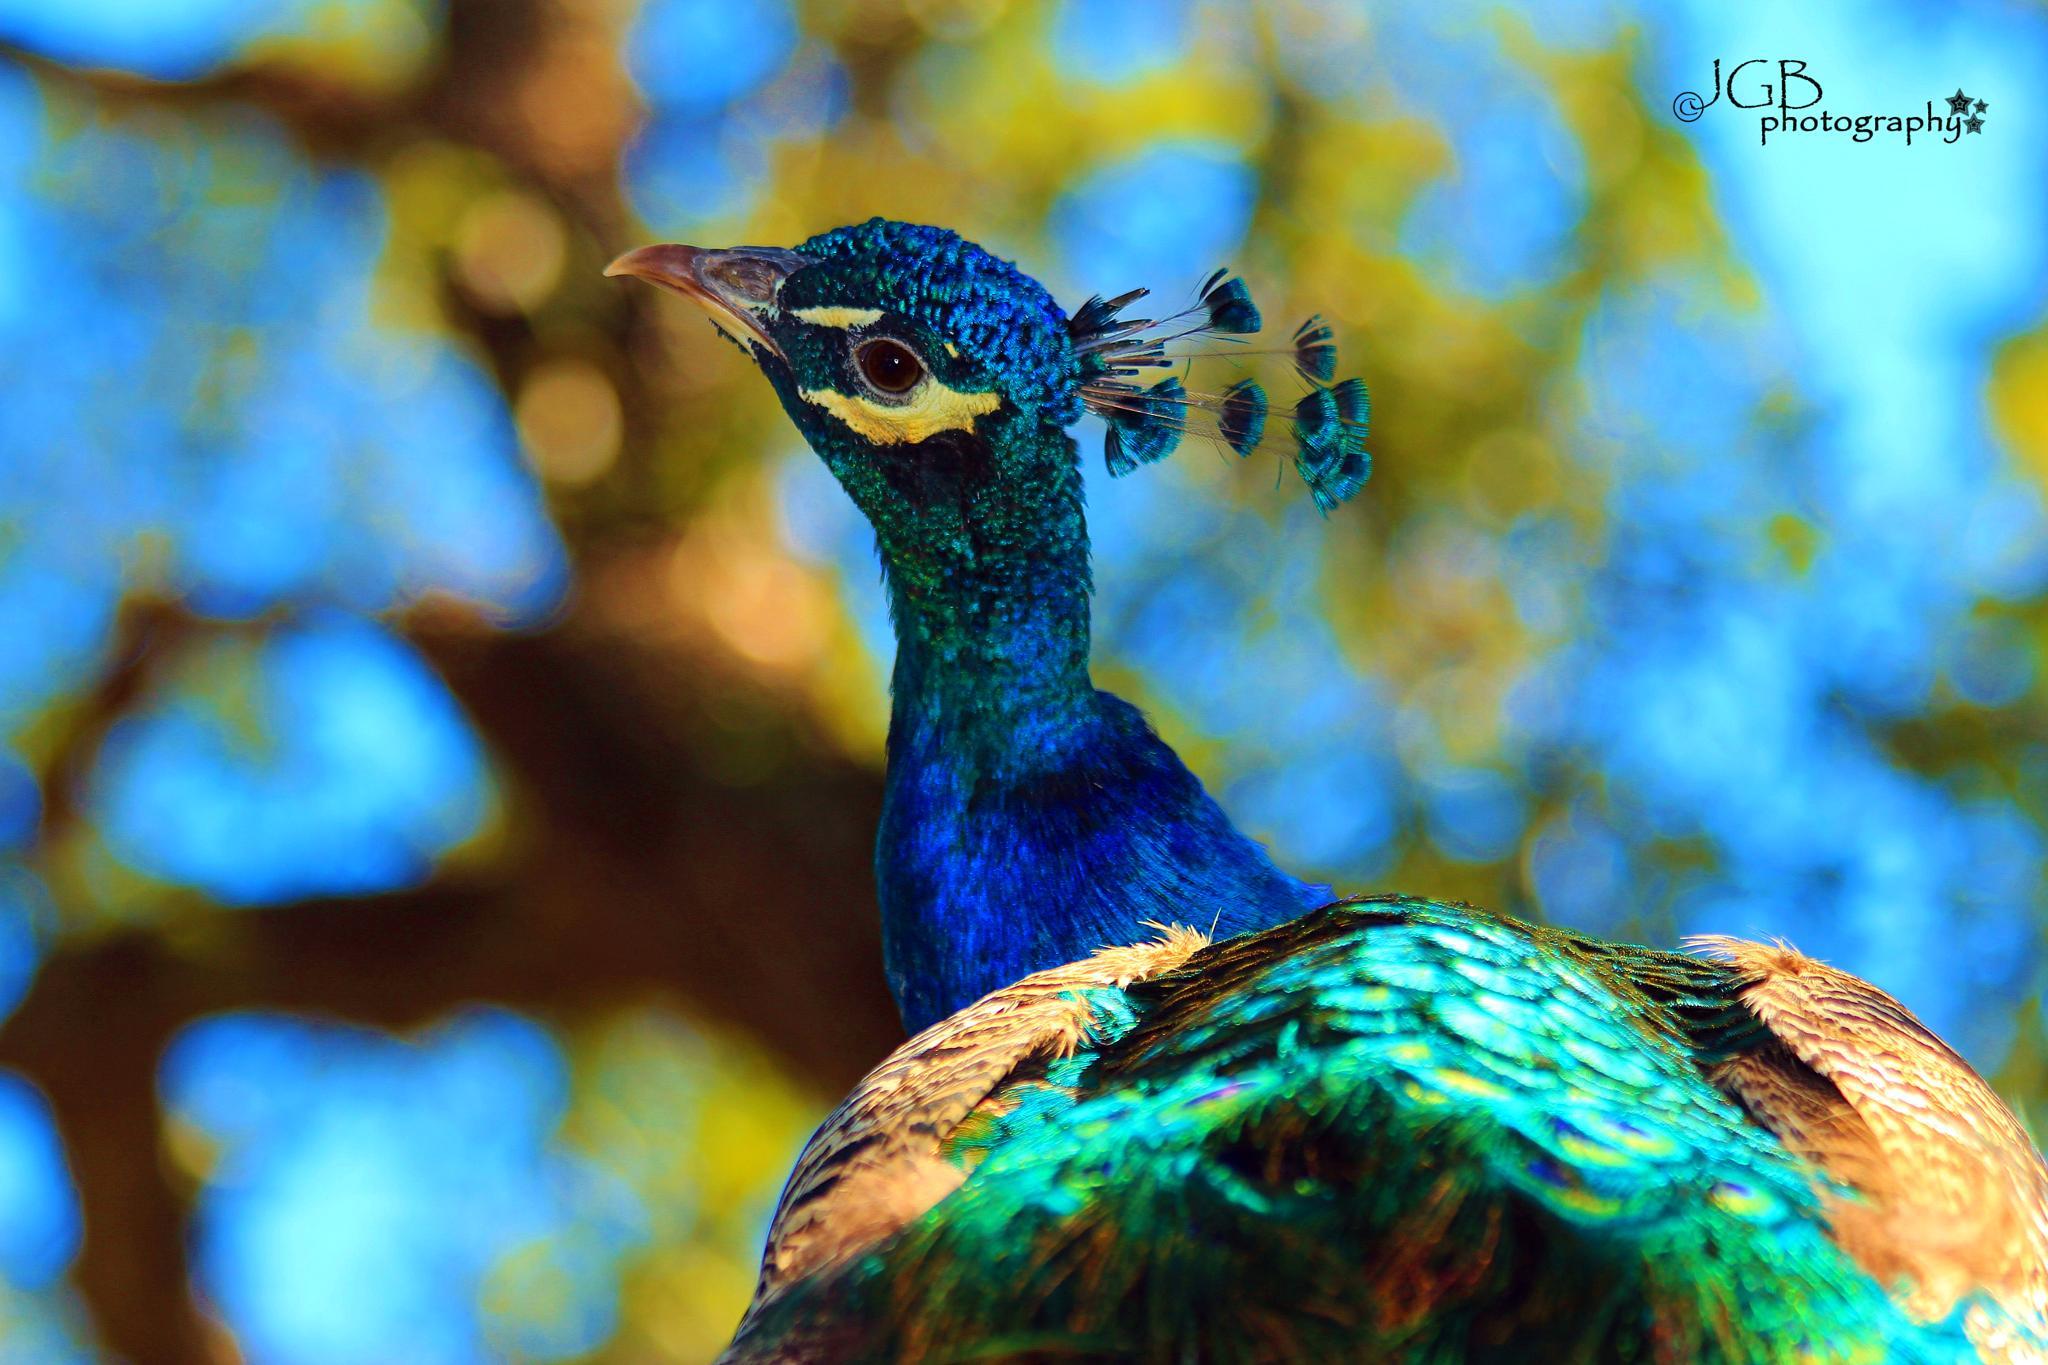 Indian Peafowl / Peacock by JonhayGBuitron